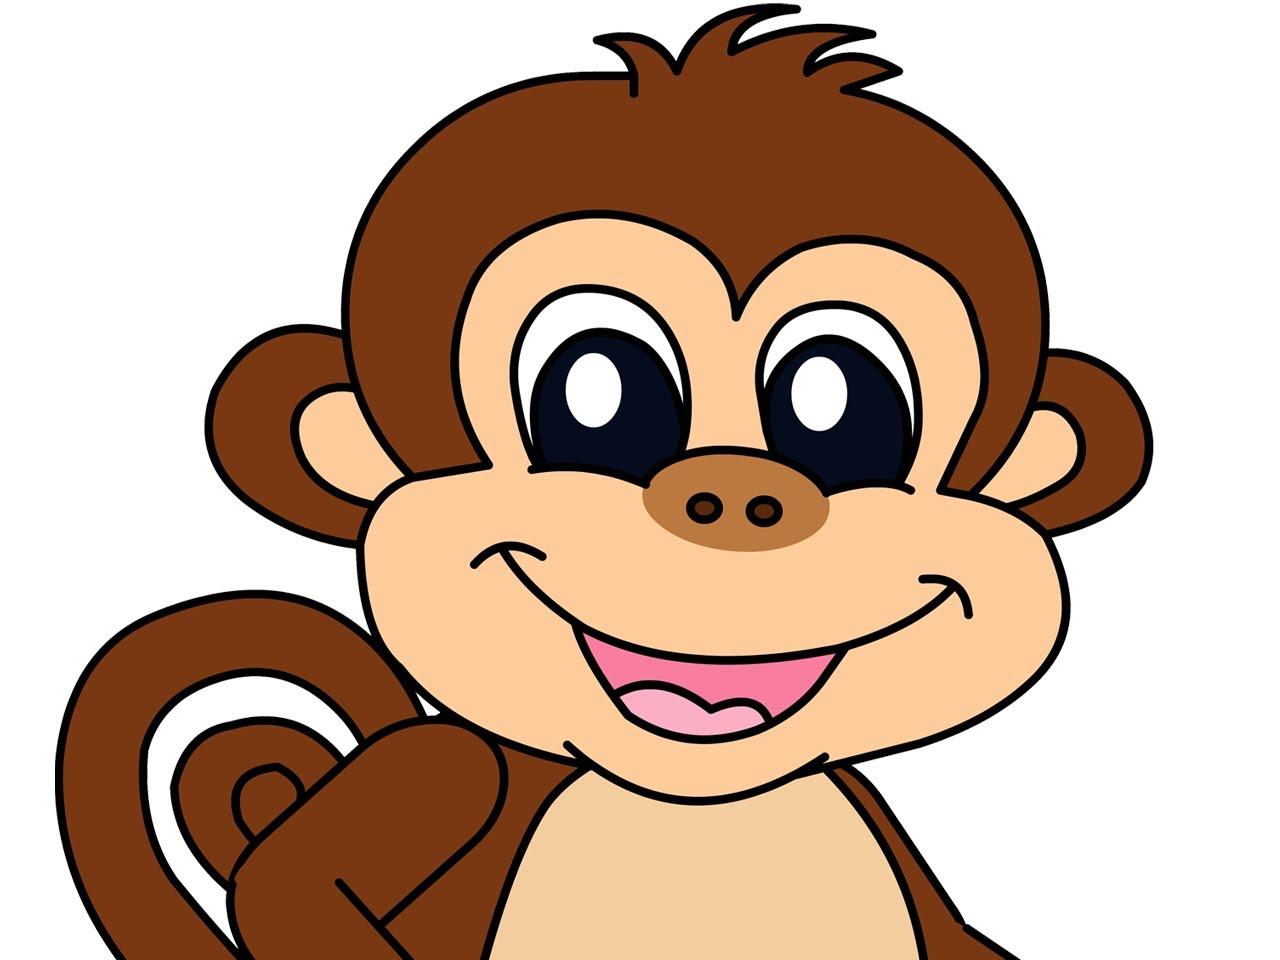 Cartoon baby monkeys